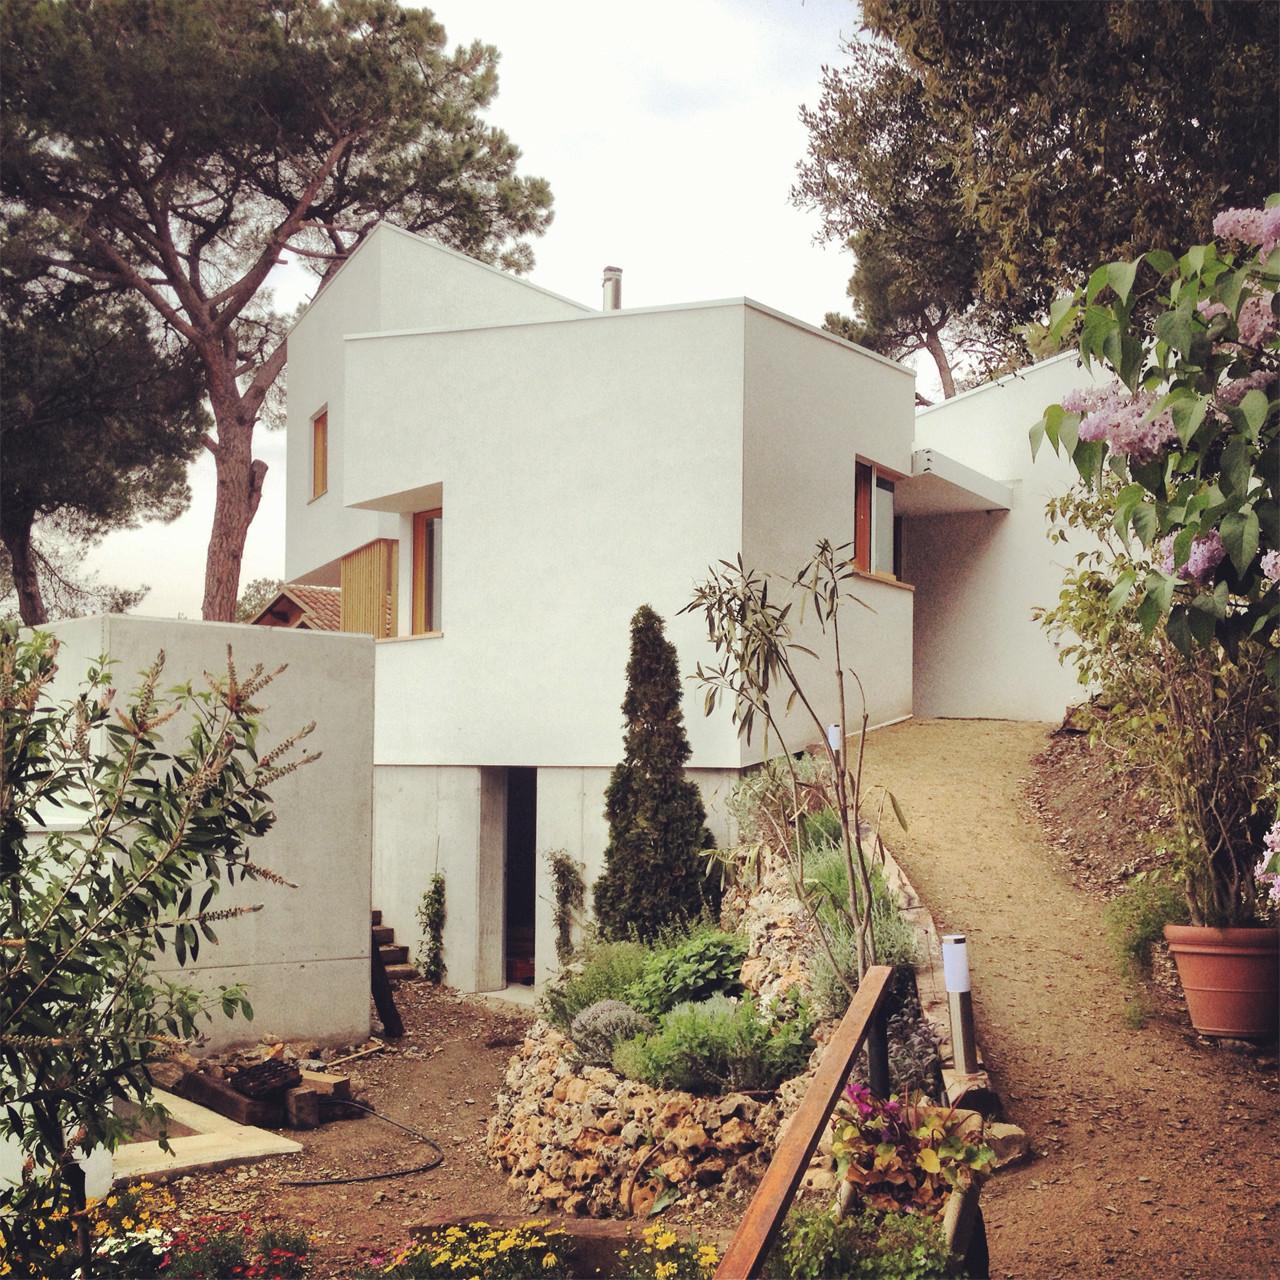 La Floresta House / Alventosa Morell Arquitectes , Courtesy of Alventosa Morell Arquitectes